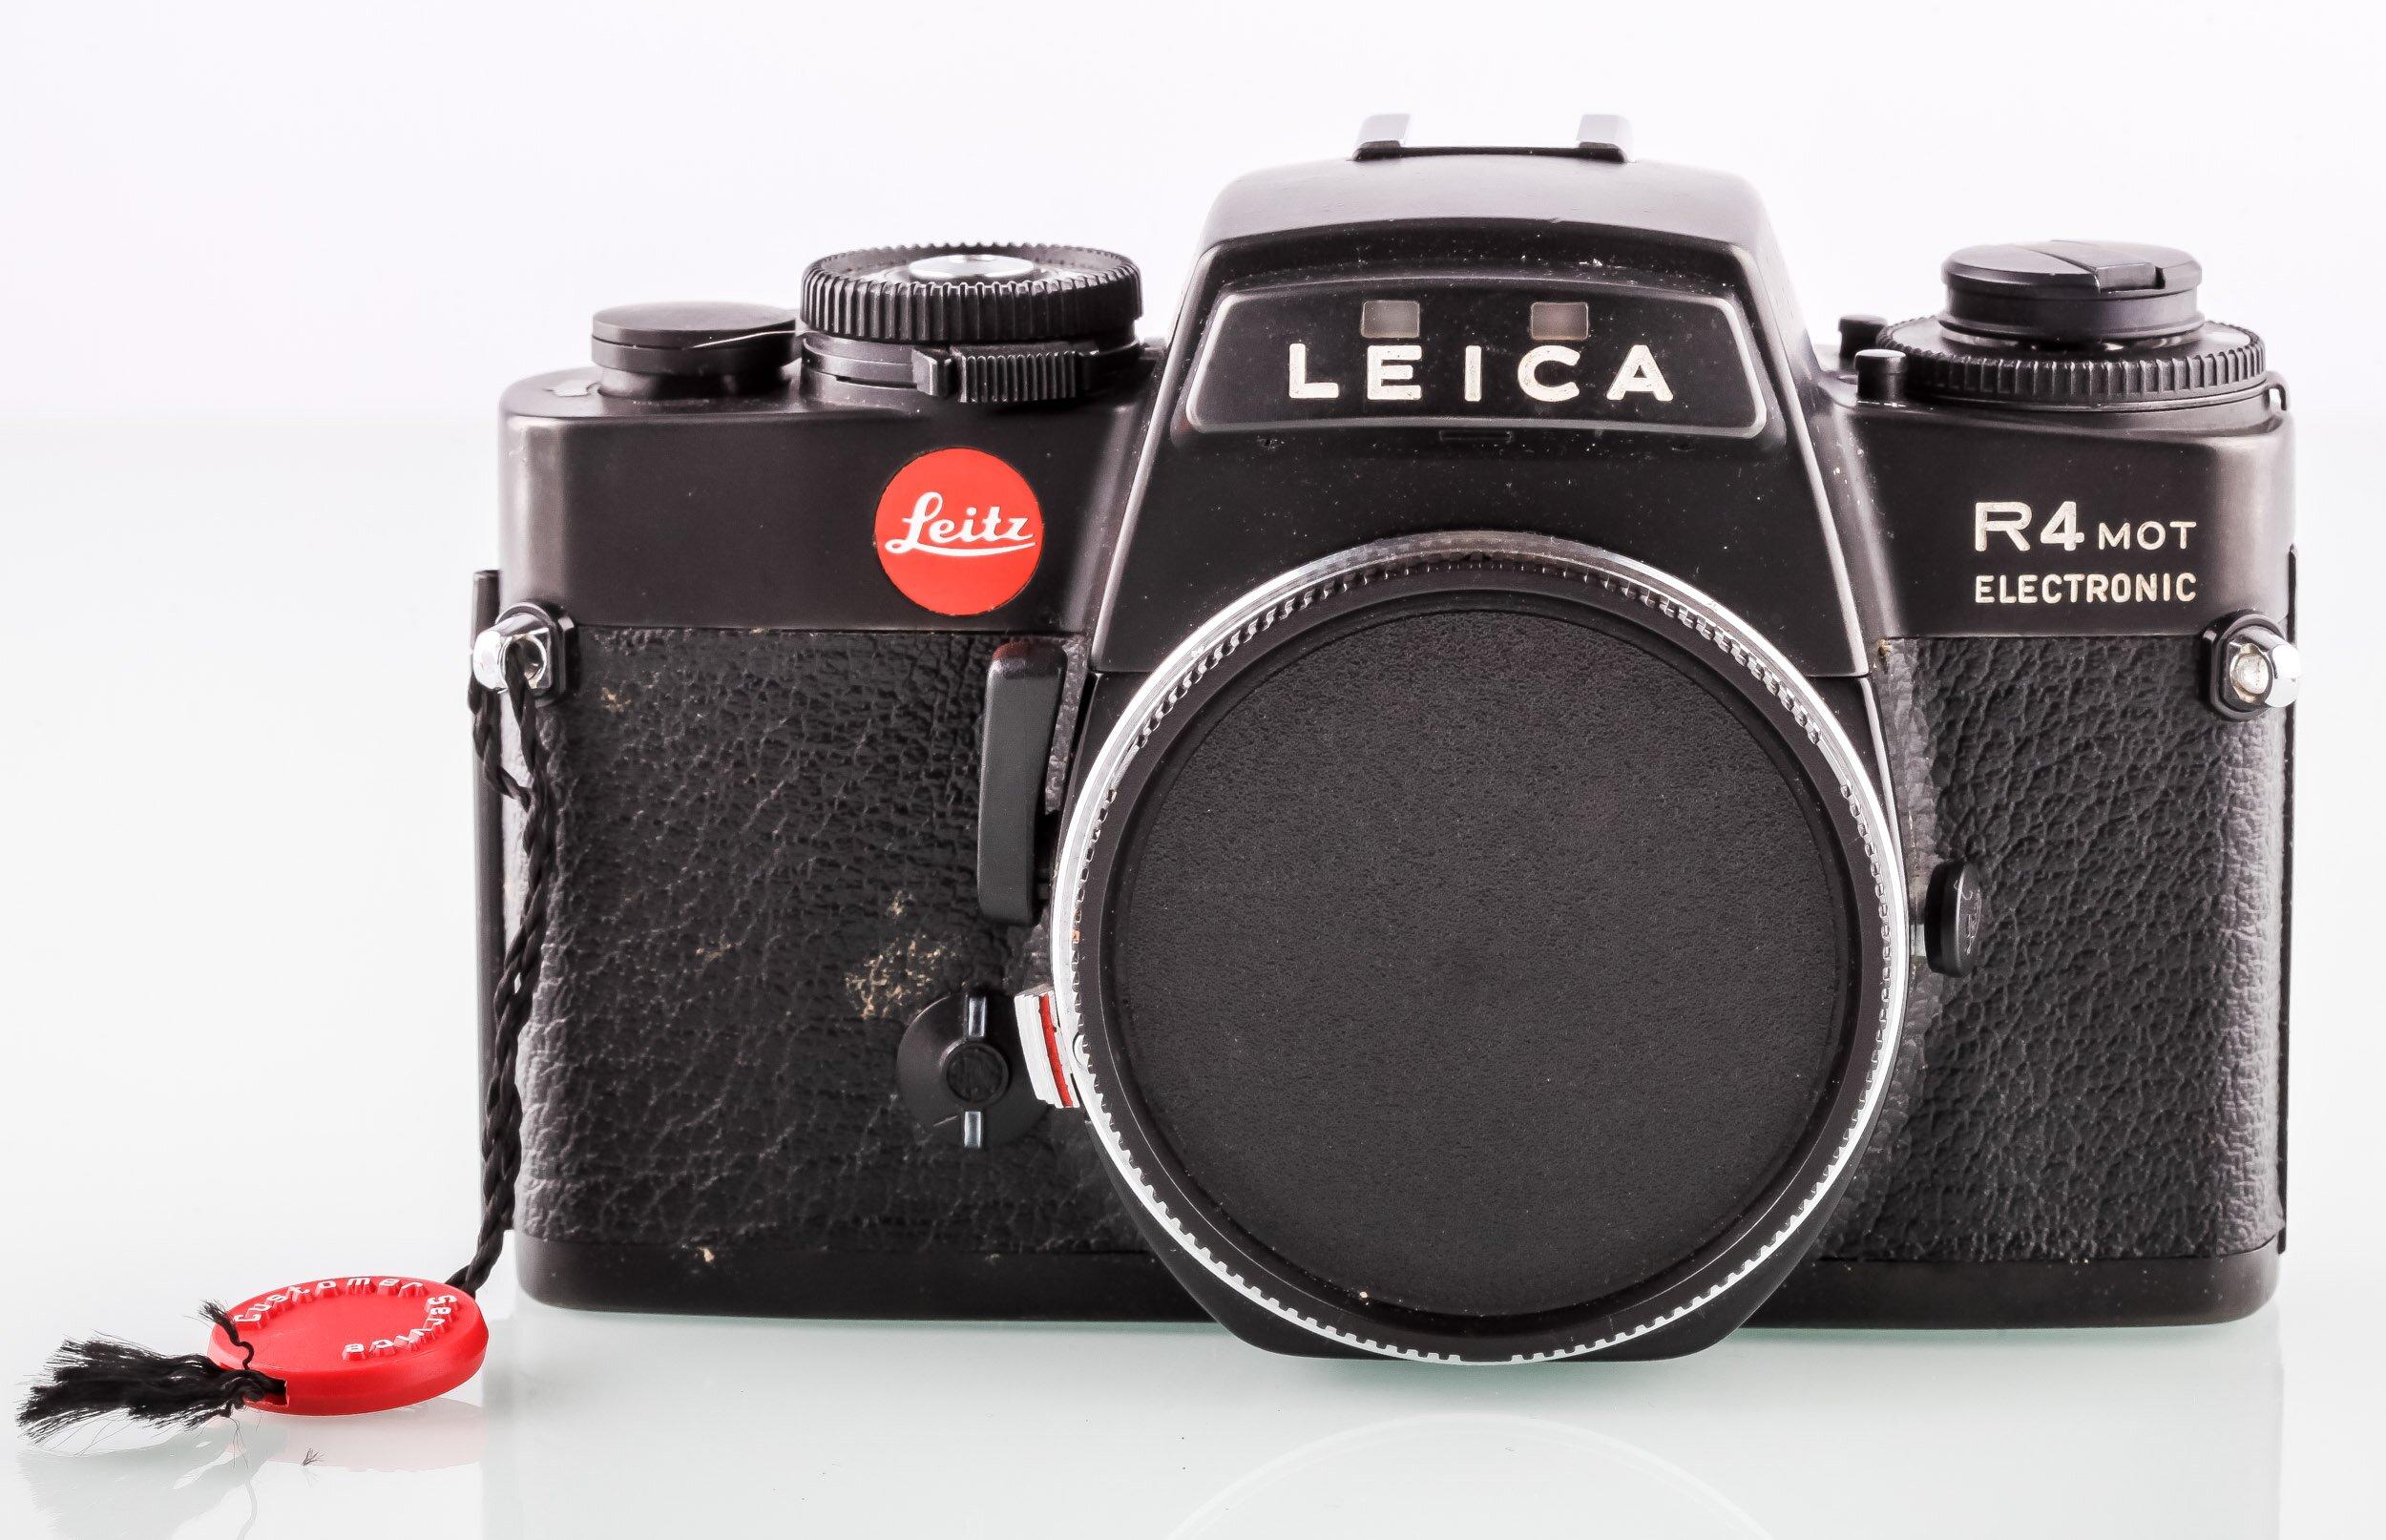 Leica R4 MOT ELECTRONIC body